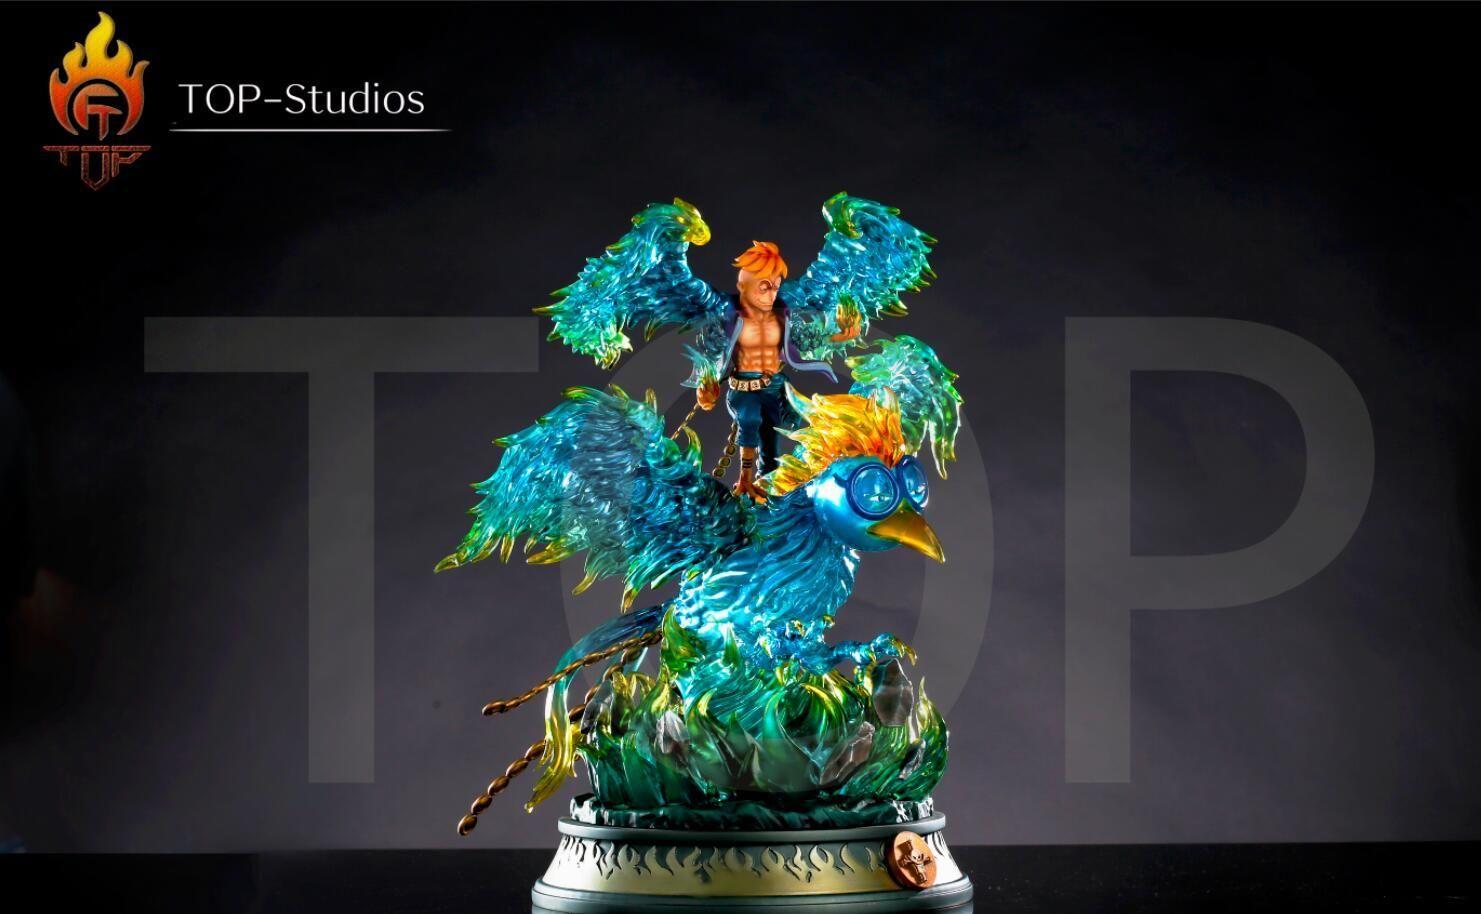 TOP Studio SD Phoenix Marco Resin Statue Collectible